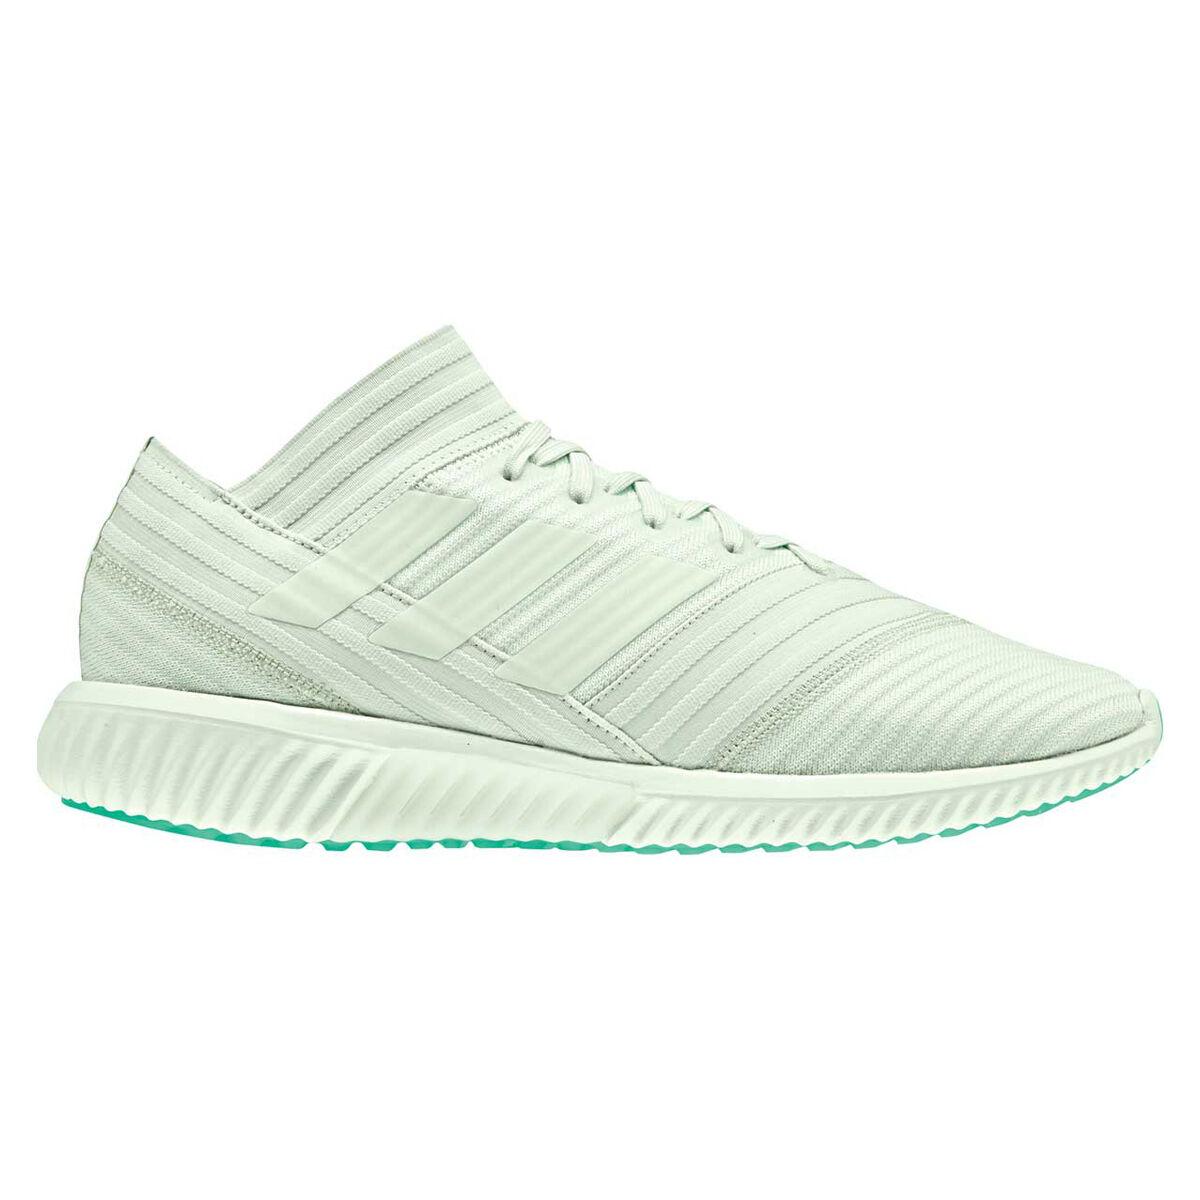 adidas Nemeziz Tango 17.1 TR Mens Indoor Soccer Shoes